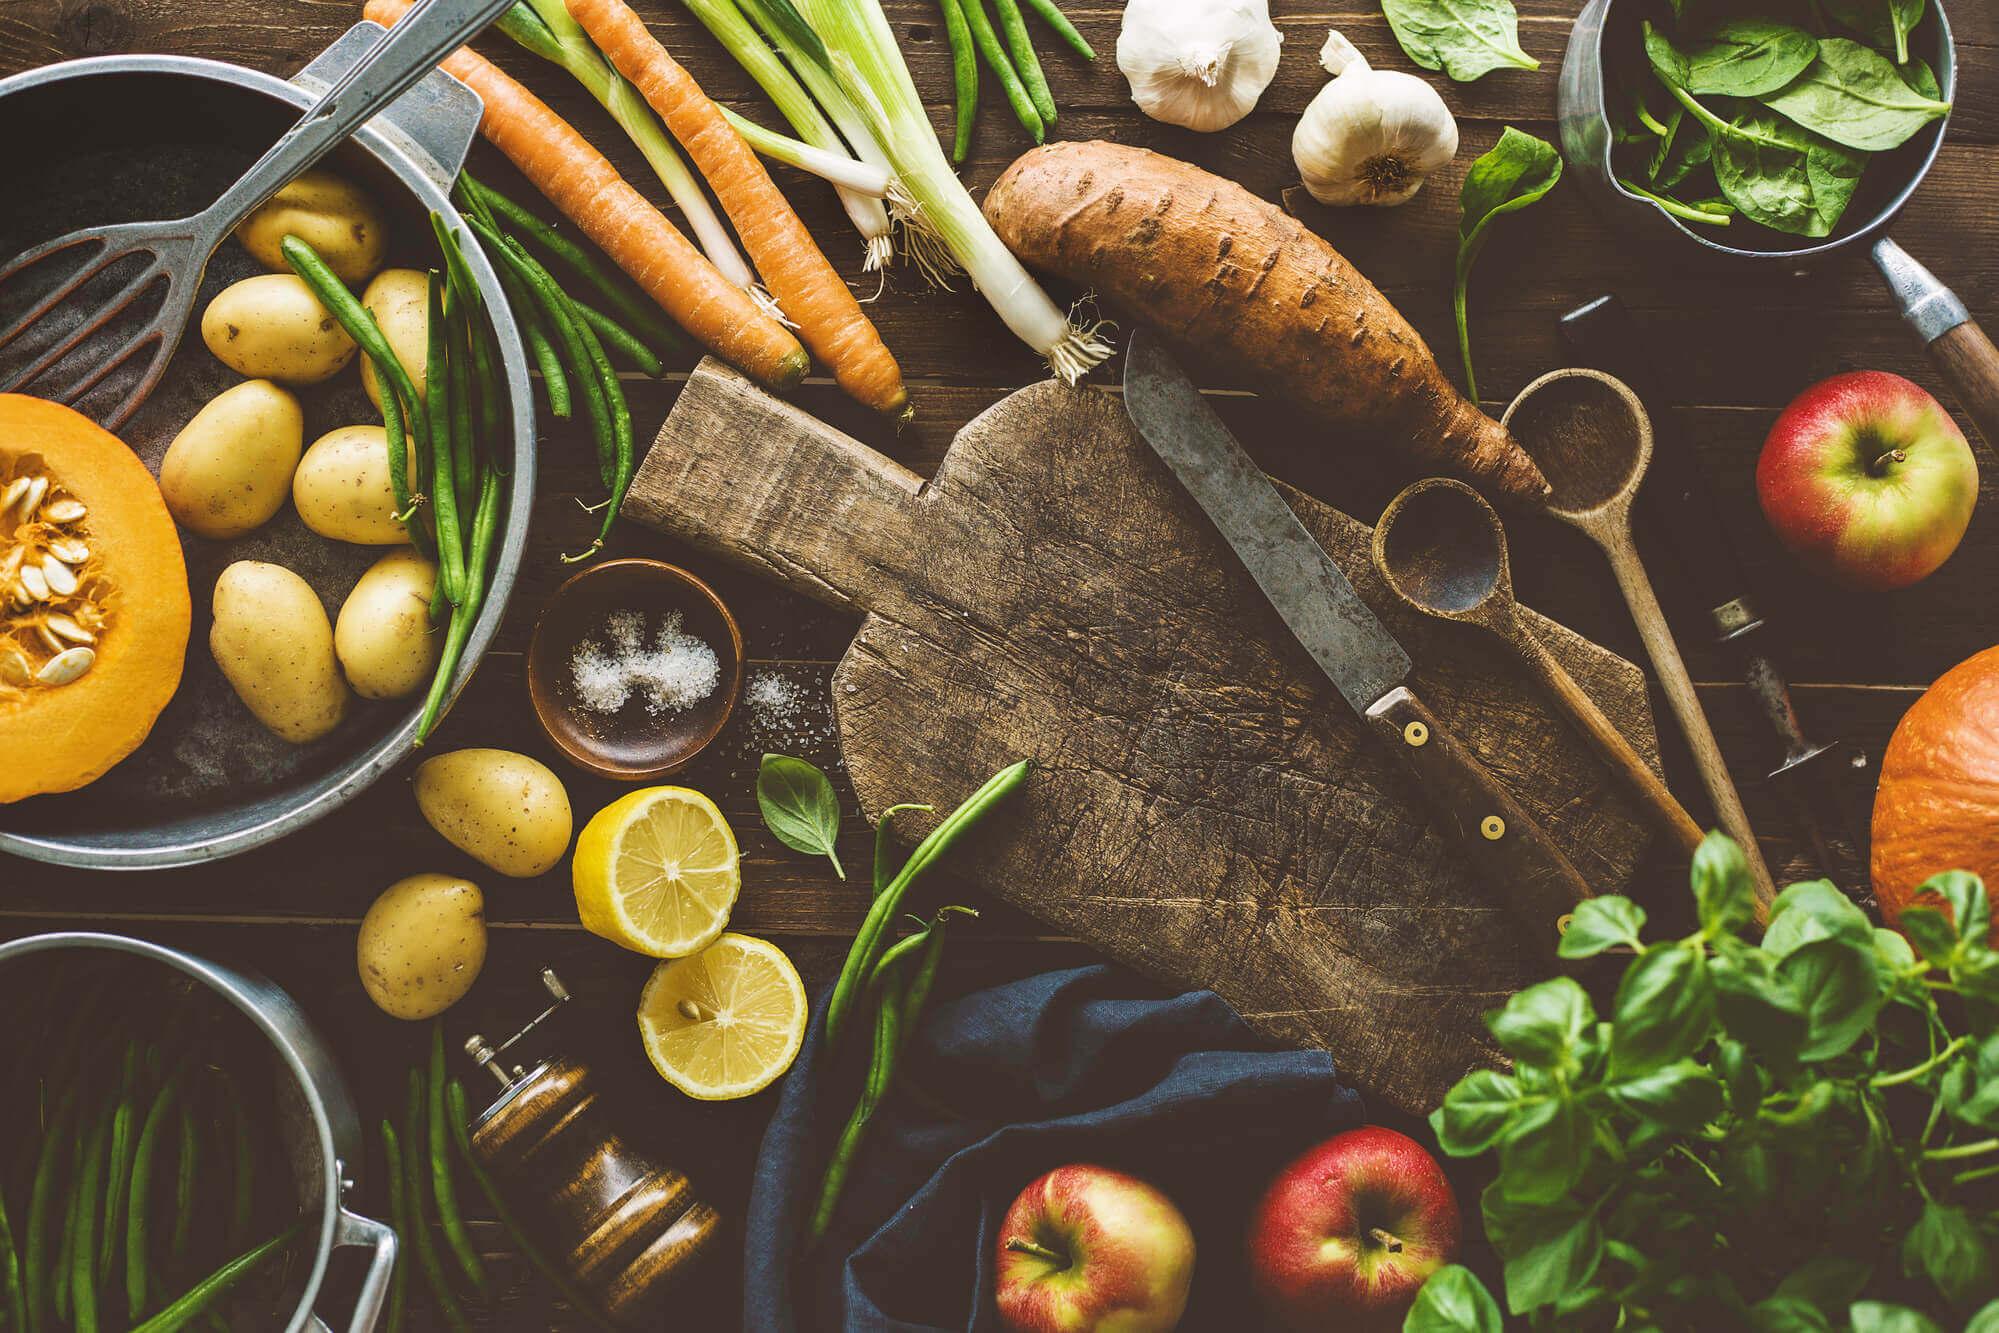 Produce With A Long Shelf Life